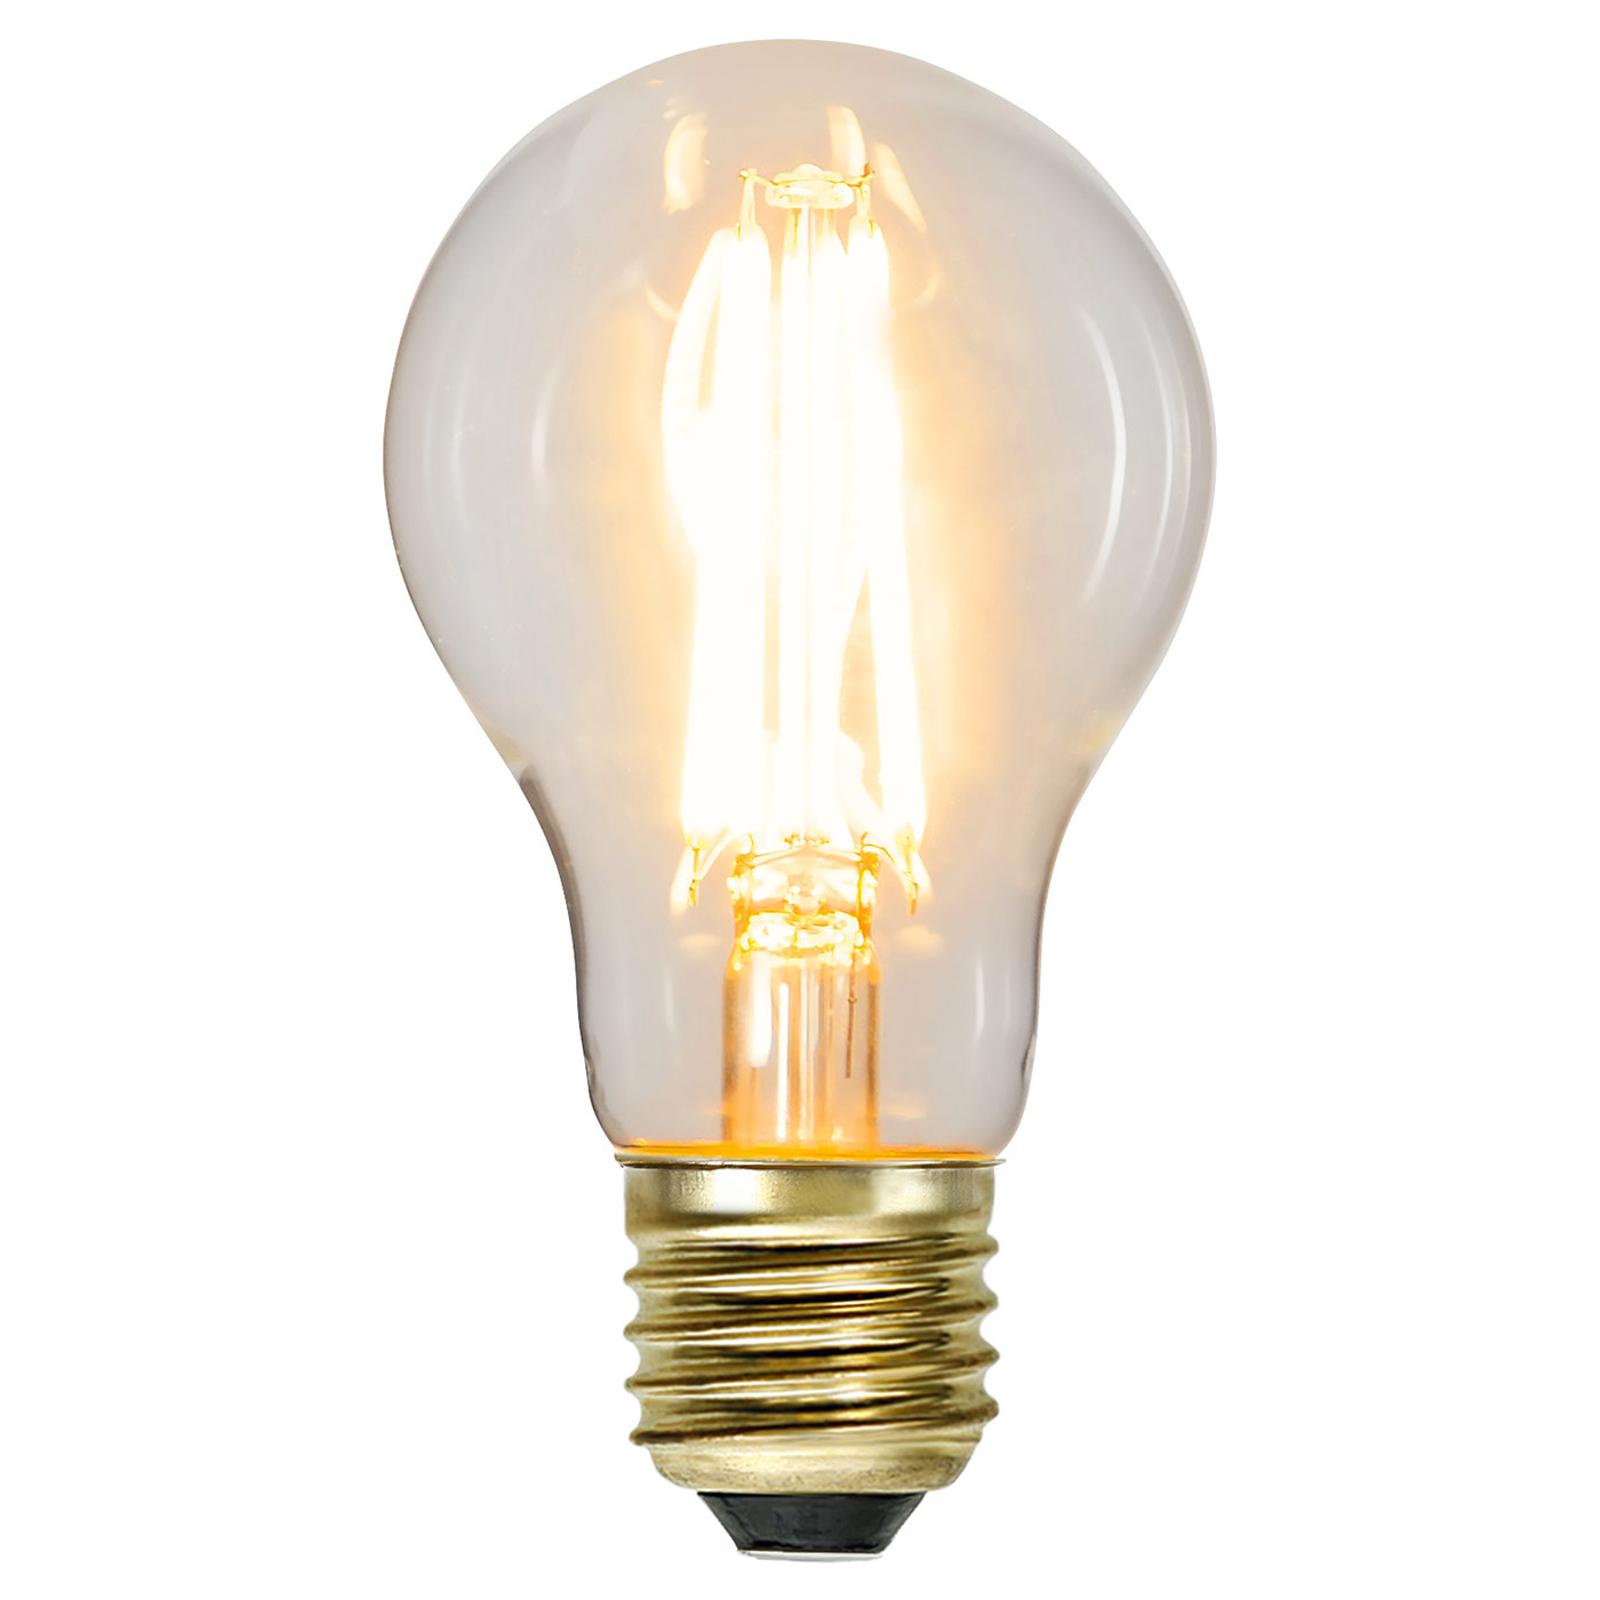 LED-pære E27 6,5W Soft Glow 2100 K 3-trinn dimbar